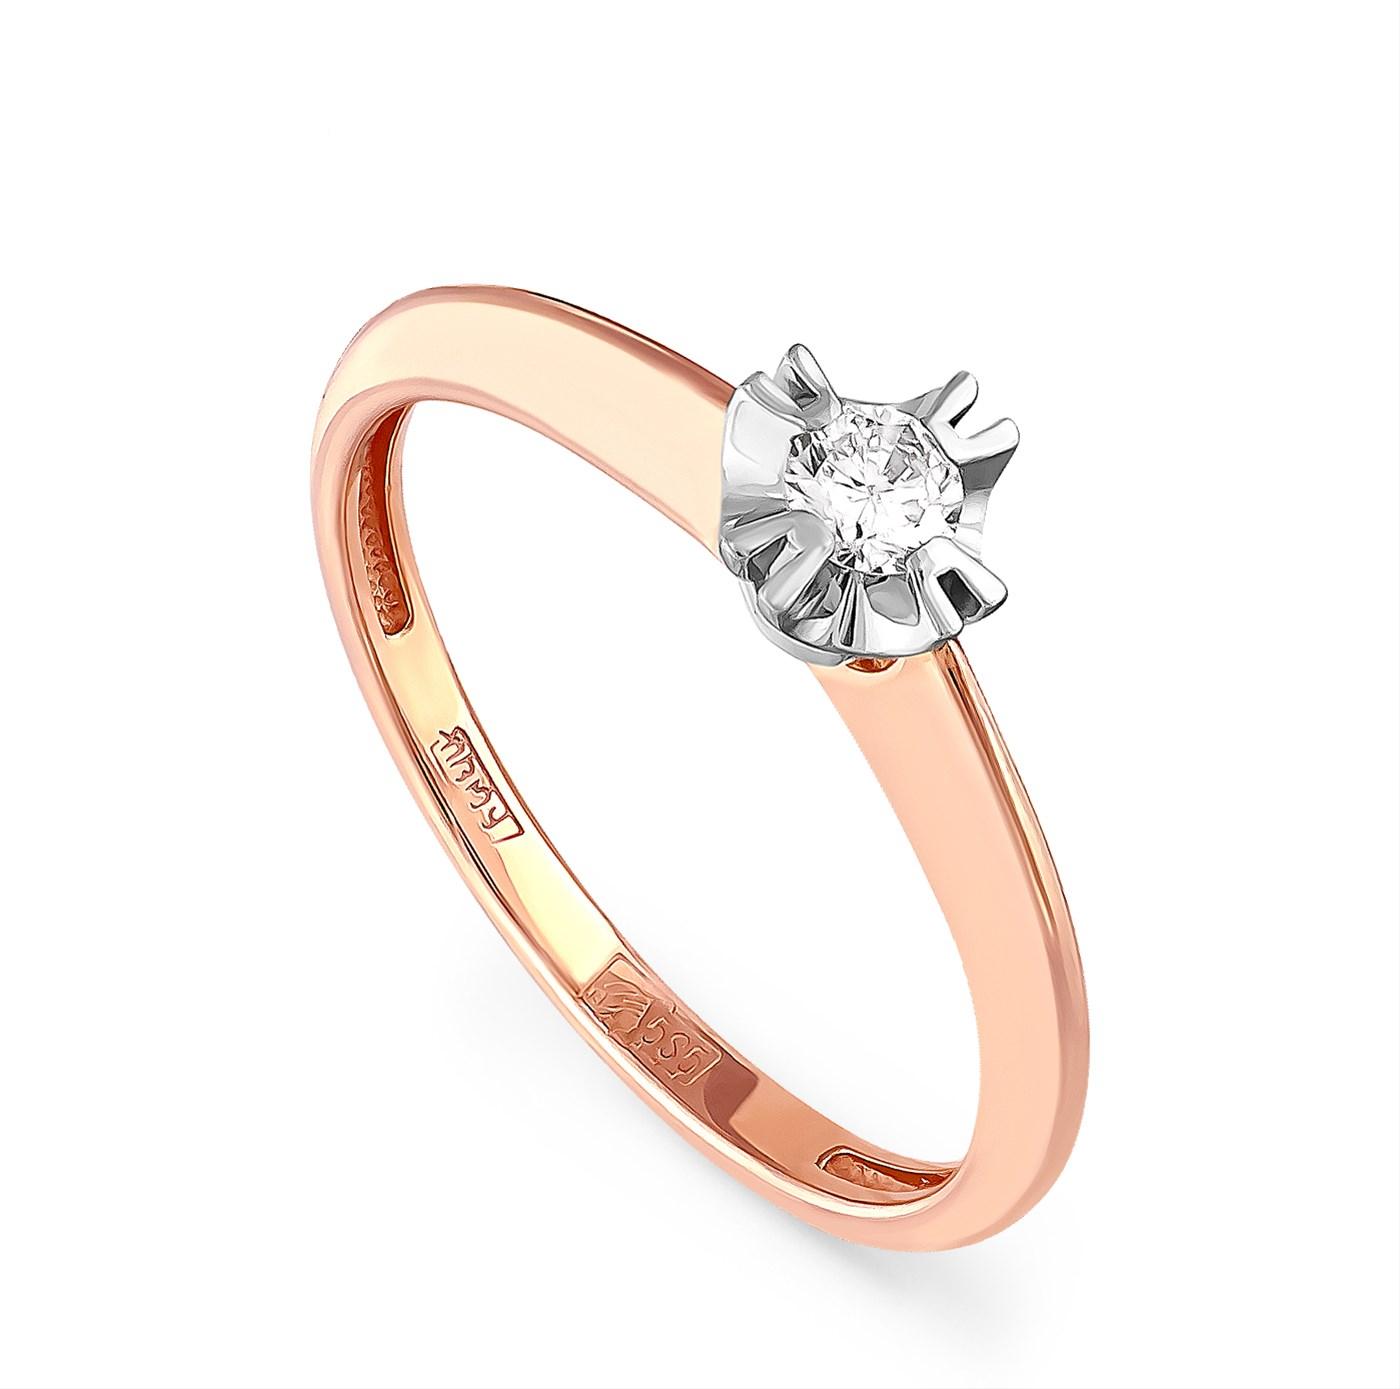 Золотое кольцо Бриллиант арт. 1-0264-1000 1-0264-1000